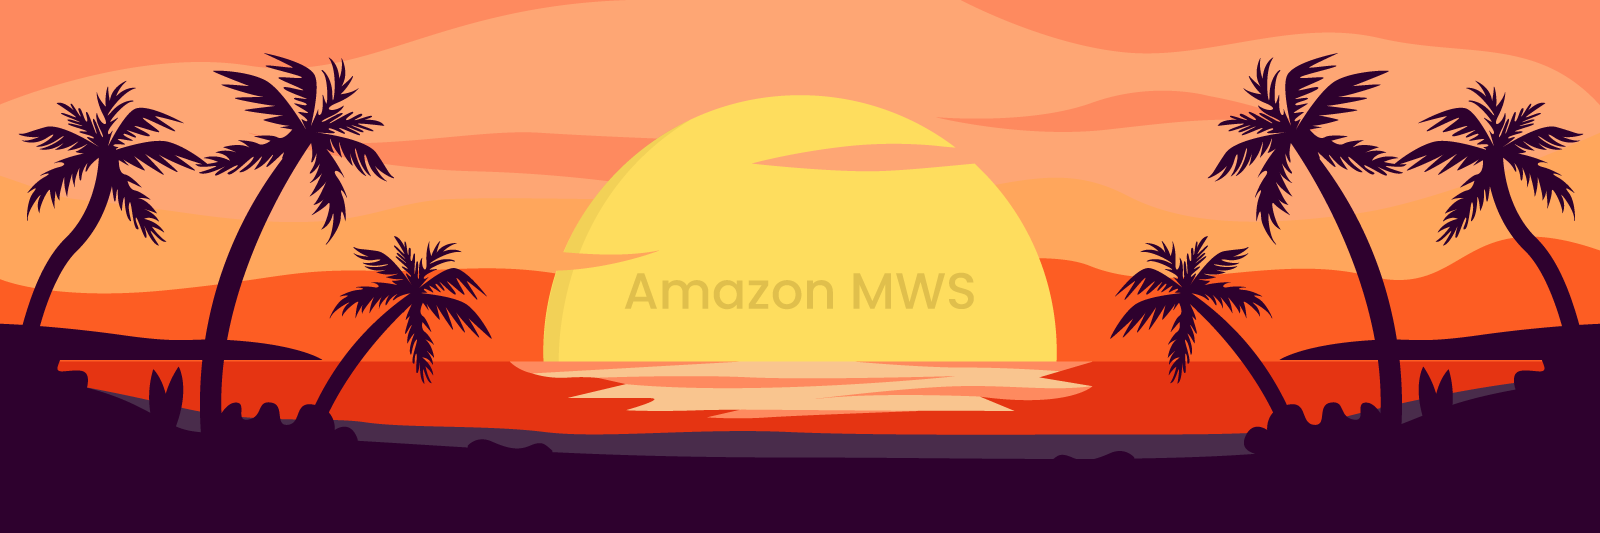 Amazon Marketplace Web Service (Amazon MWS)is being sunsetted